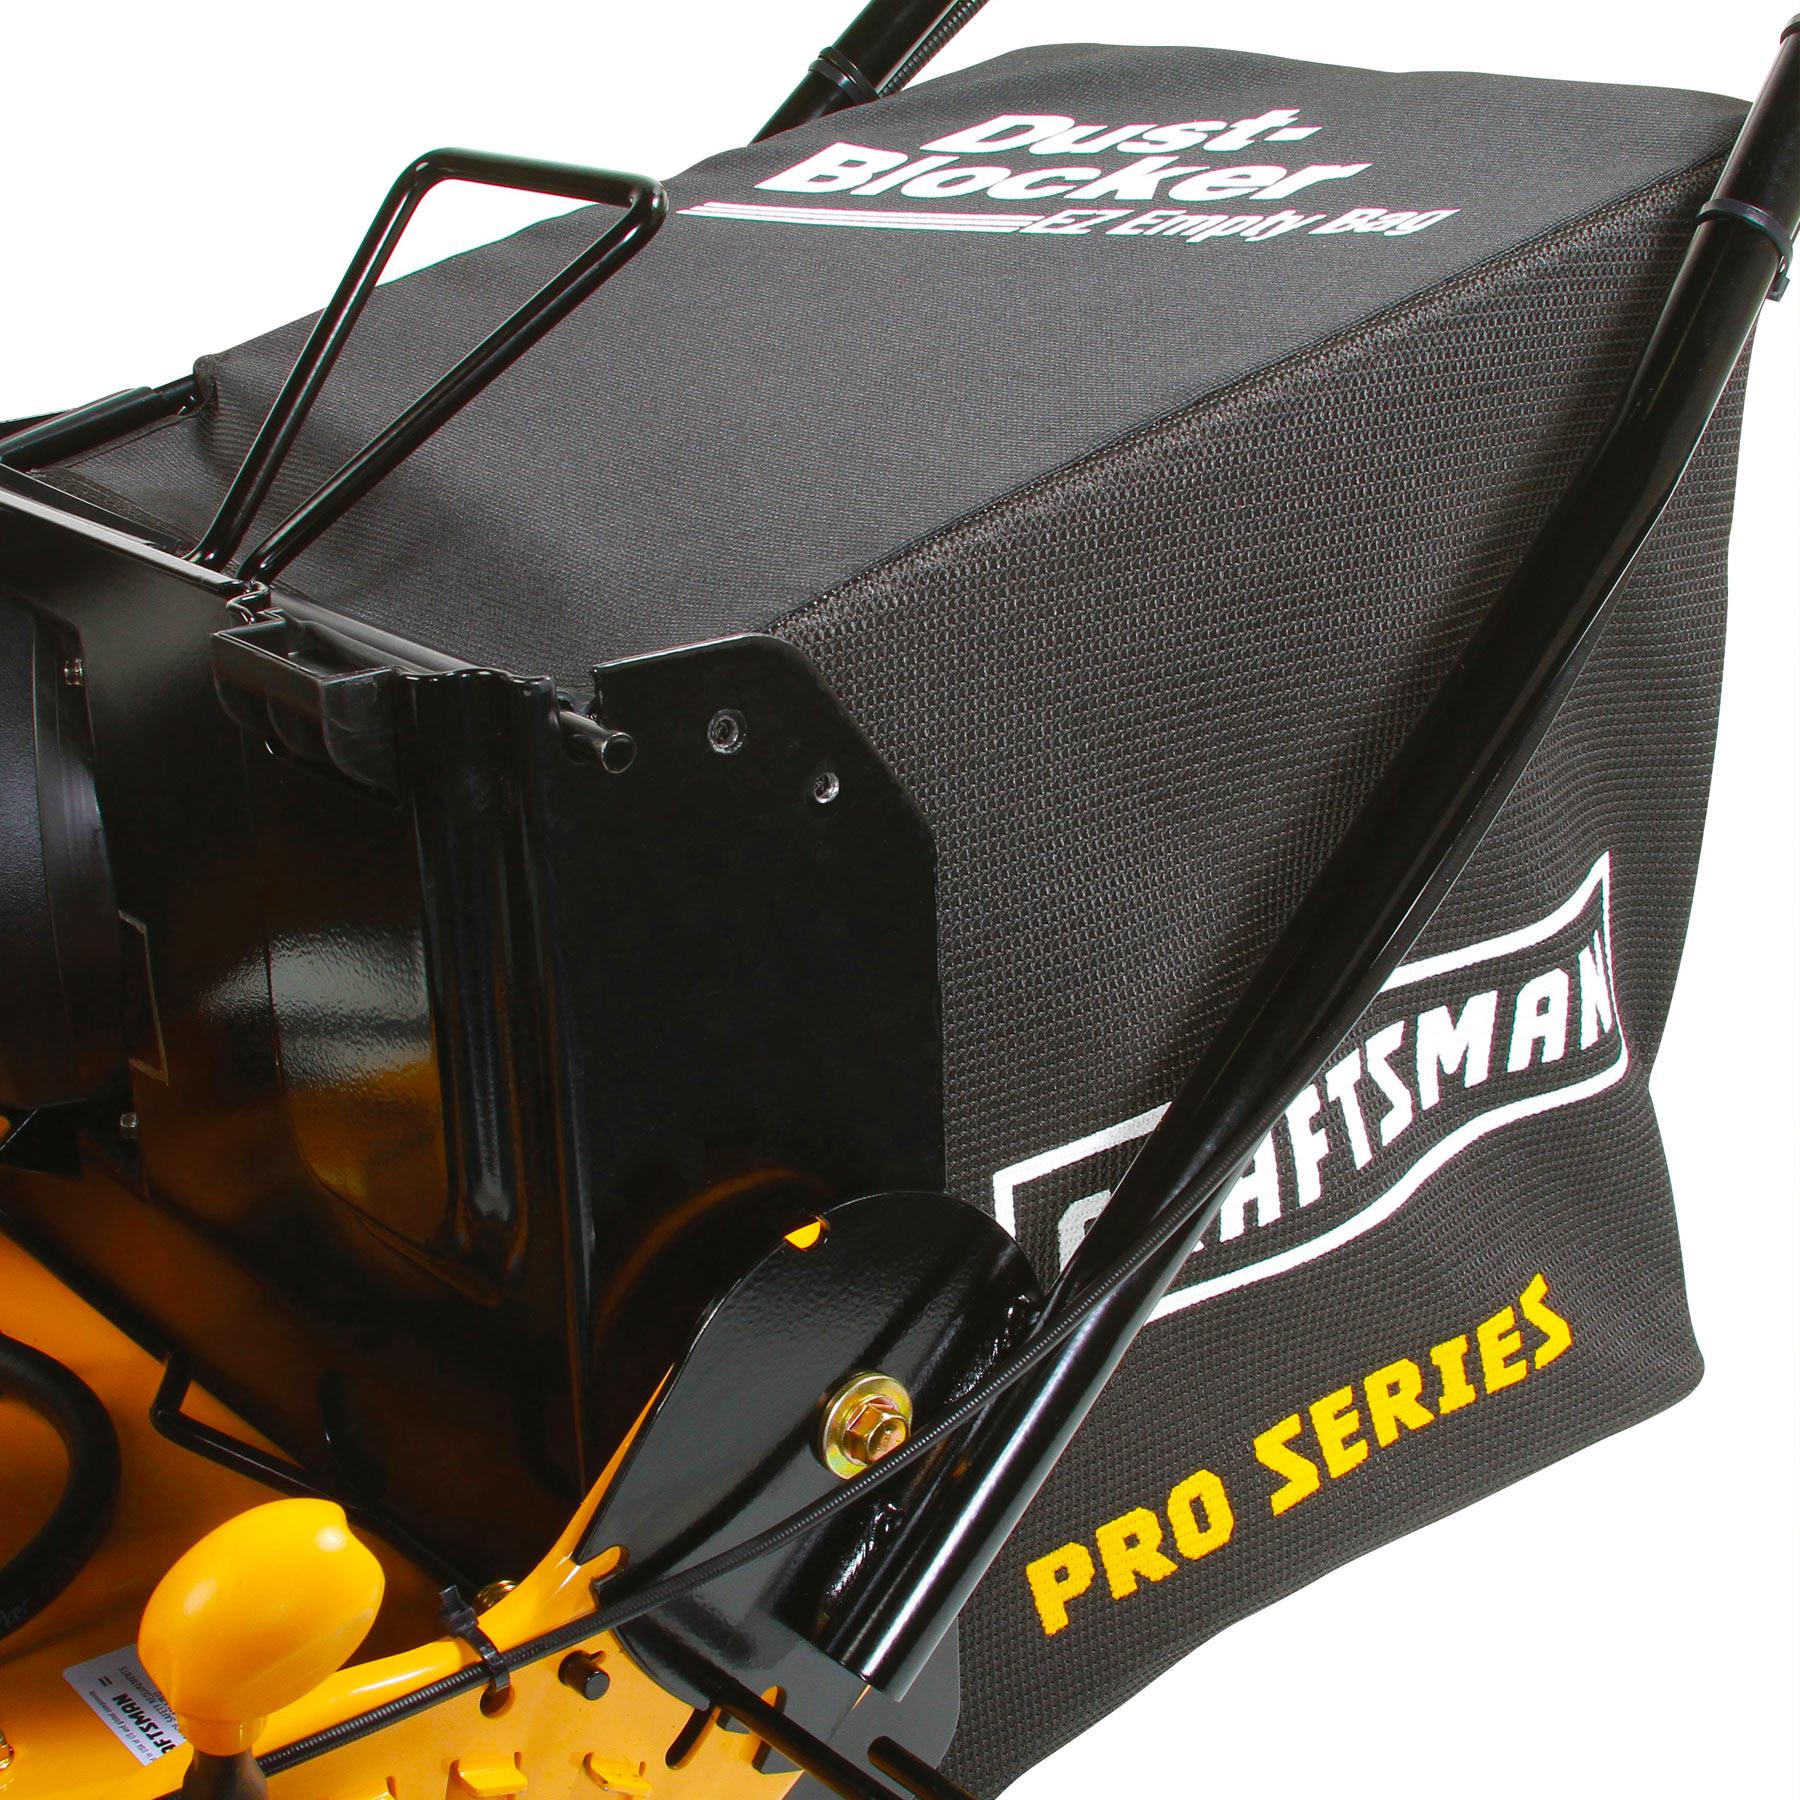 Craftsman 19a20002799 28 Quot Dust Blocking Mower Bagger